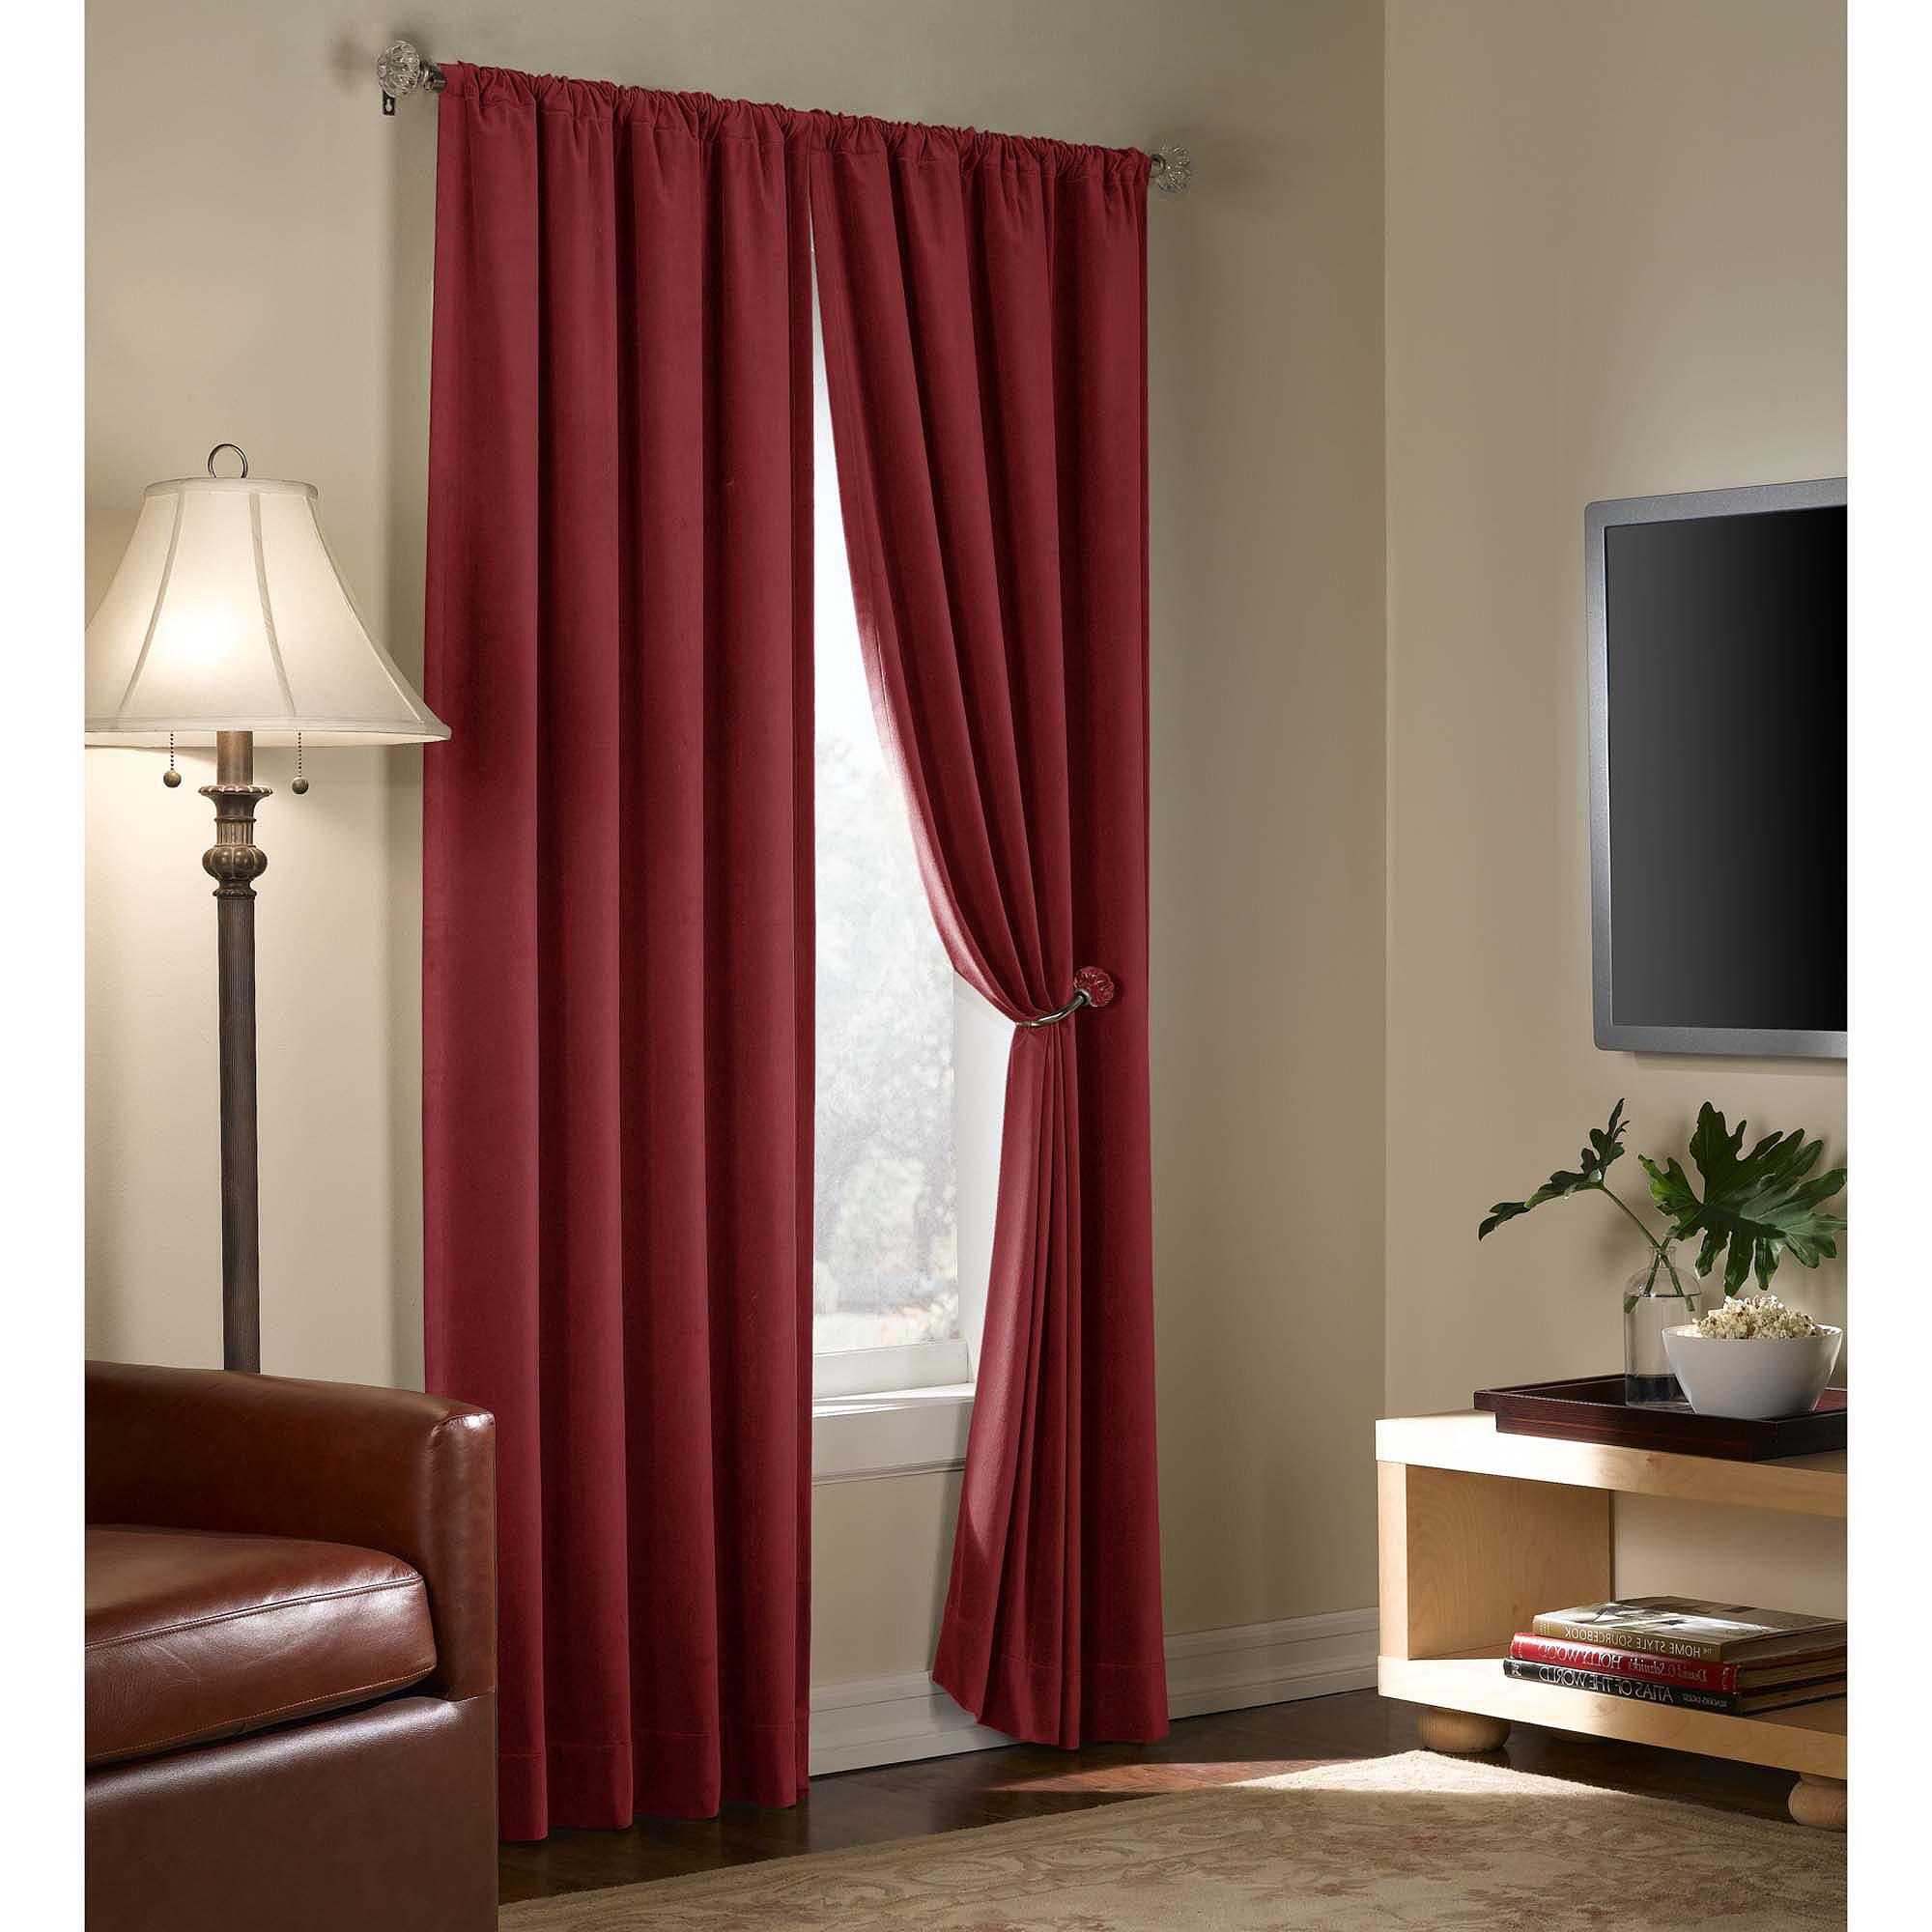 Velvet Blackout Energy Efficient Curtain Panel – Walmart In Favorite Warm Black Velvet Single Blackout Curtain Panels (View 17 of 20)